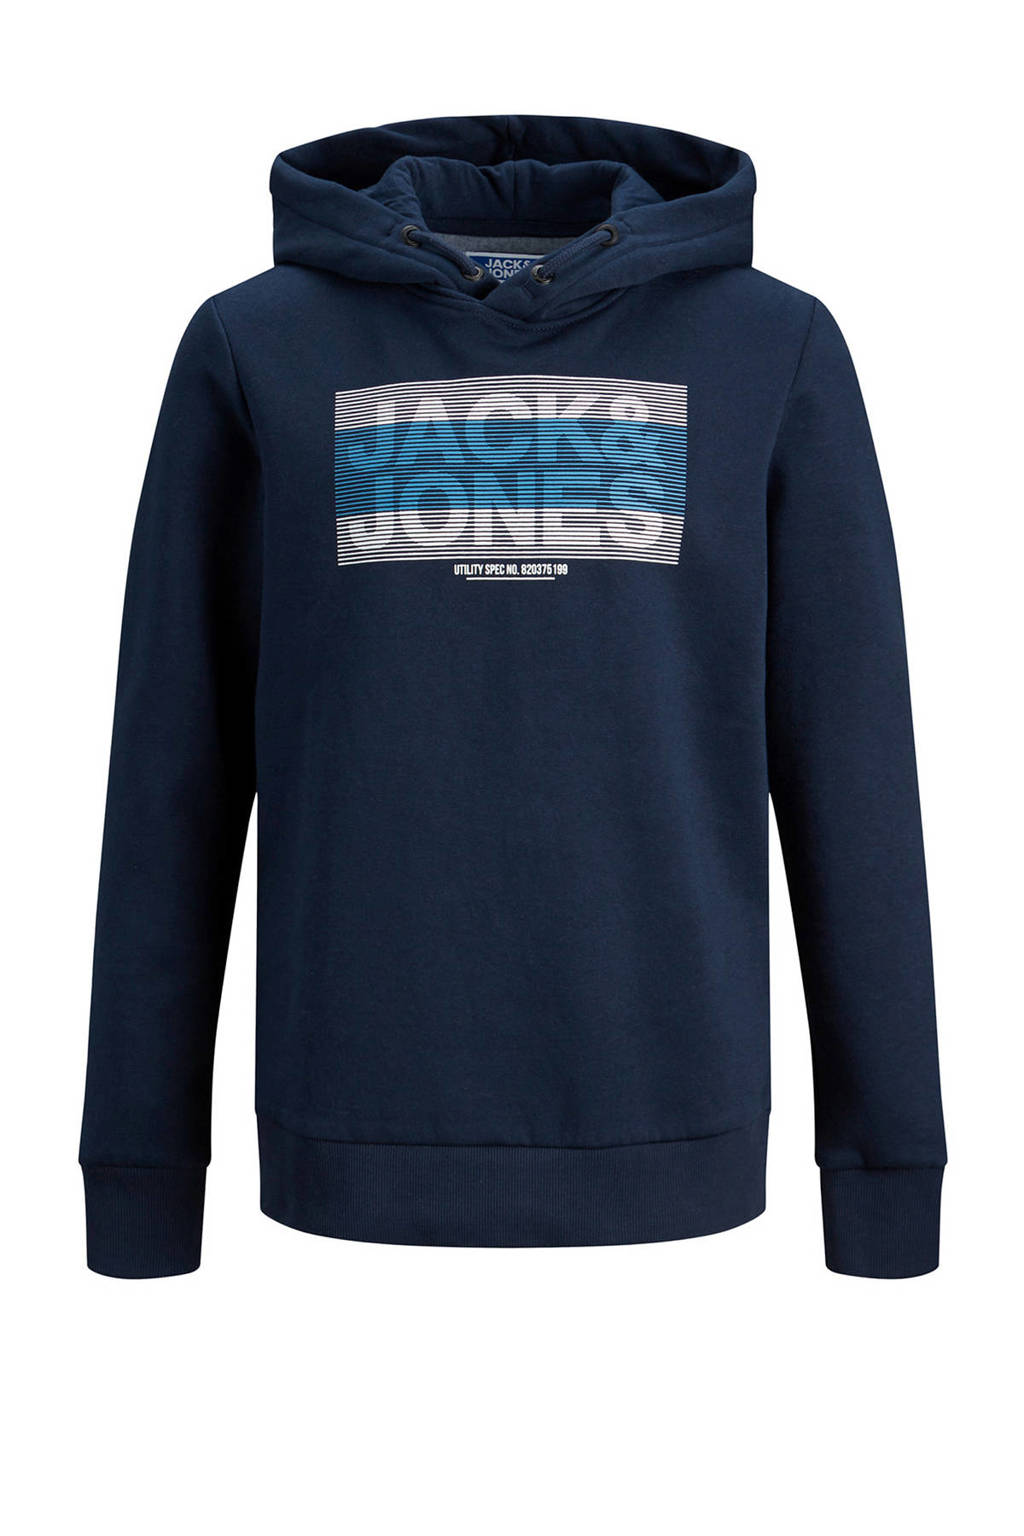 JACK & JONES JUNIOR hoodie Jumbo met logo donkerblauw, Donkerblauw